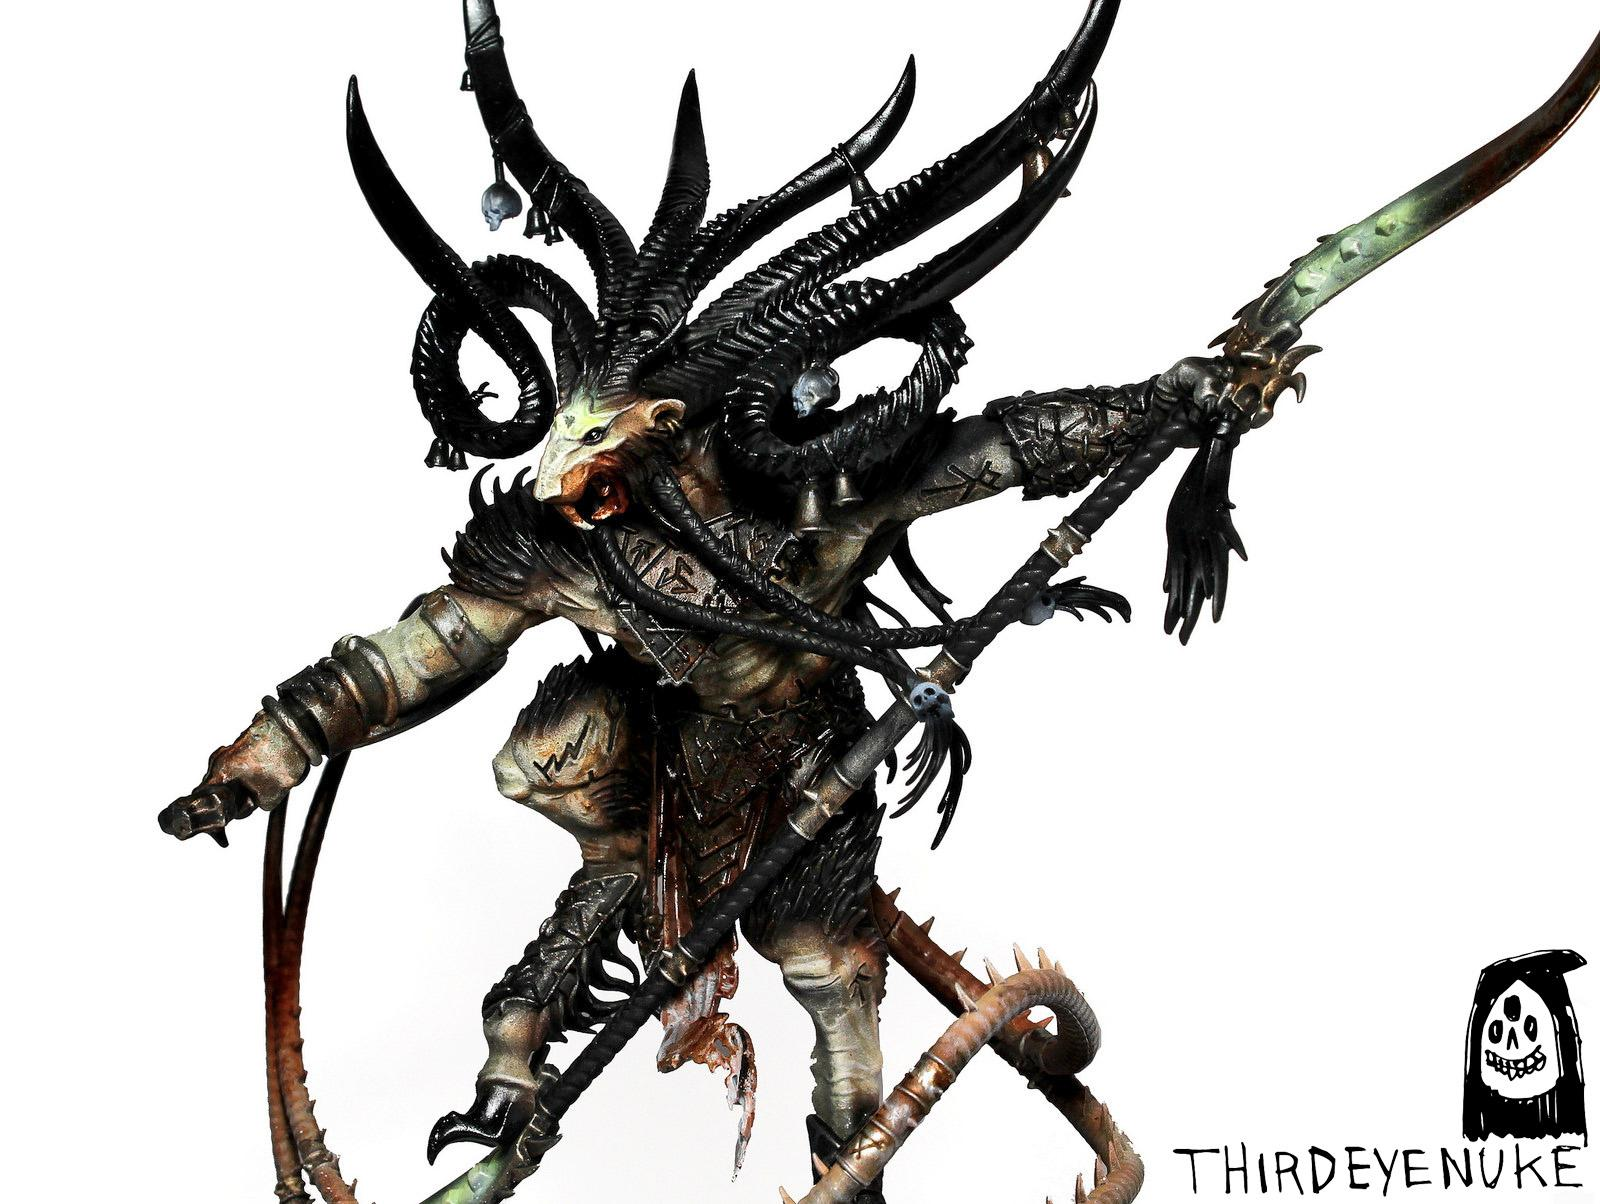 Skaven, Skreech Verminking, Thirdeyenuke, Warhammer Fantasy